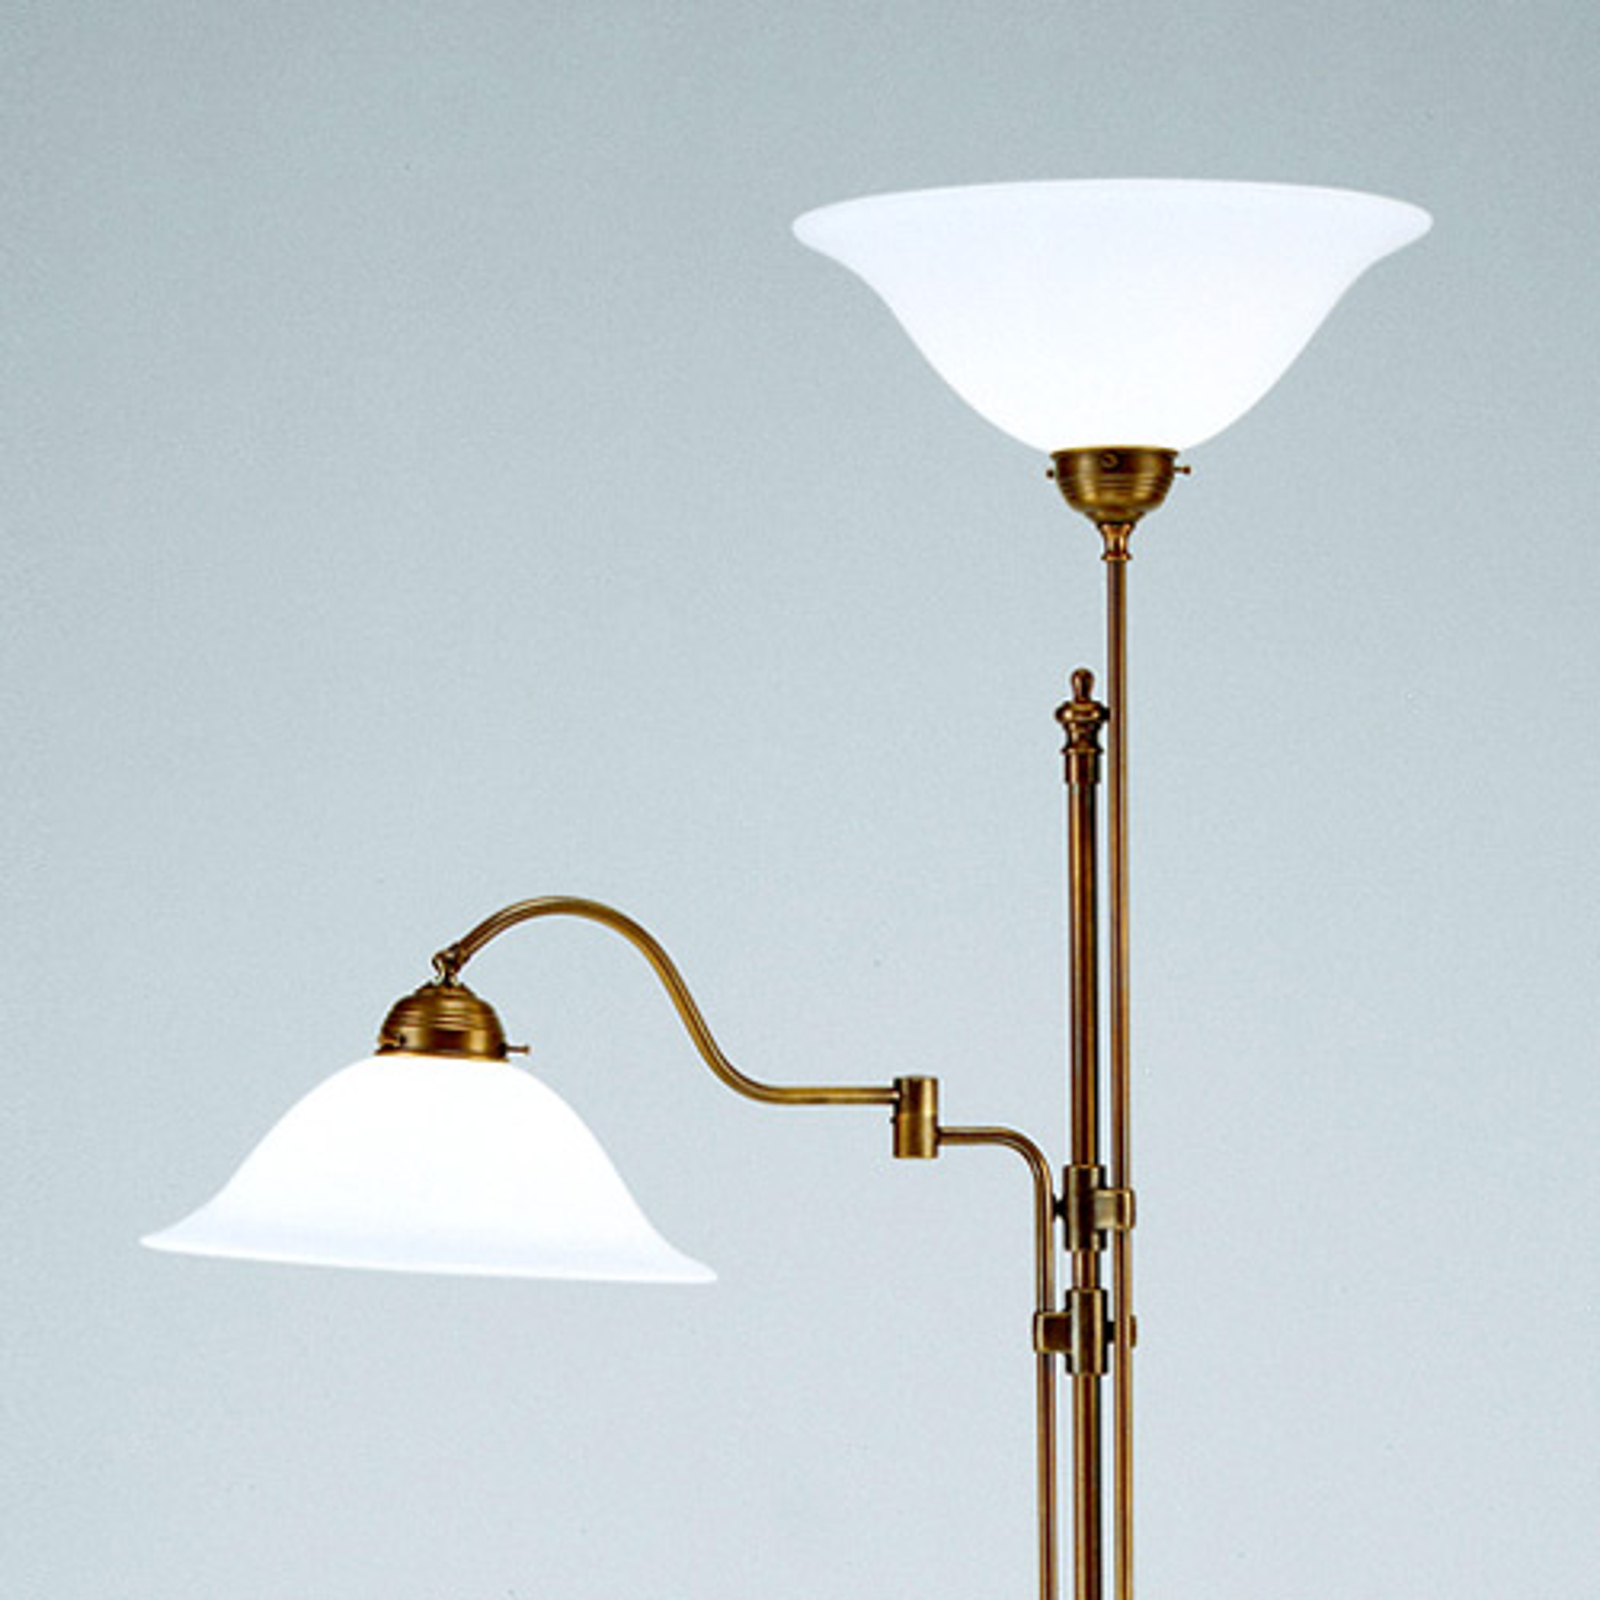 Dvoj-plameňové stropné svietidlo Gustav